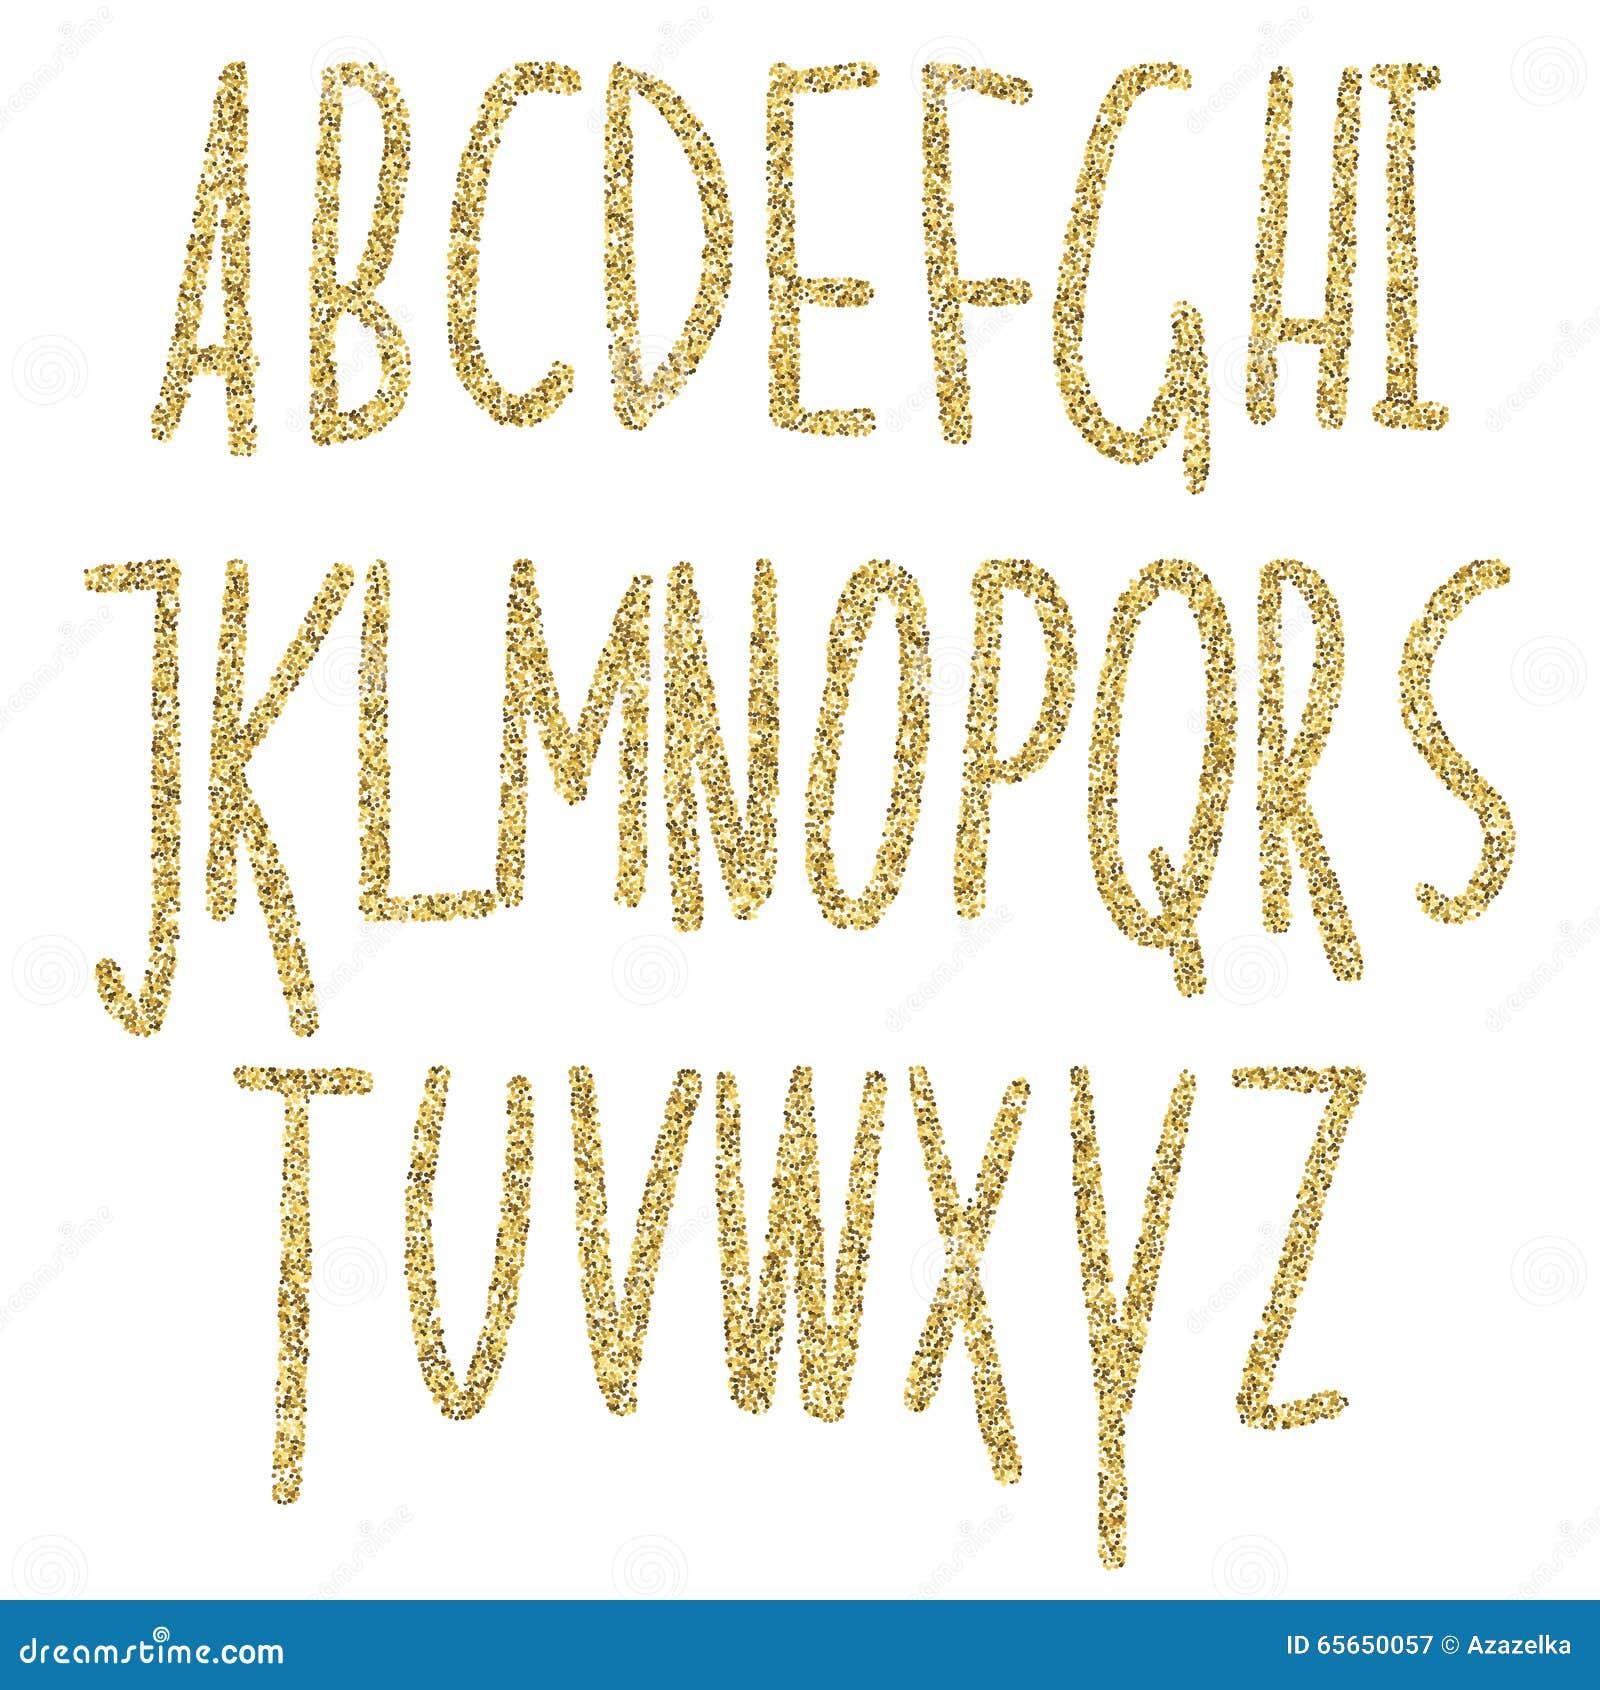 Gold Glitter Sparkling Alphabet  Decorative Golden Luxury Letters